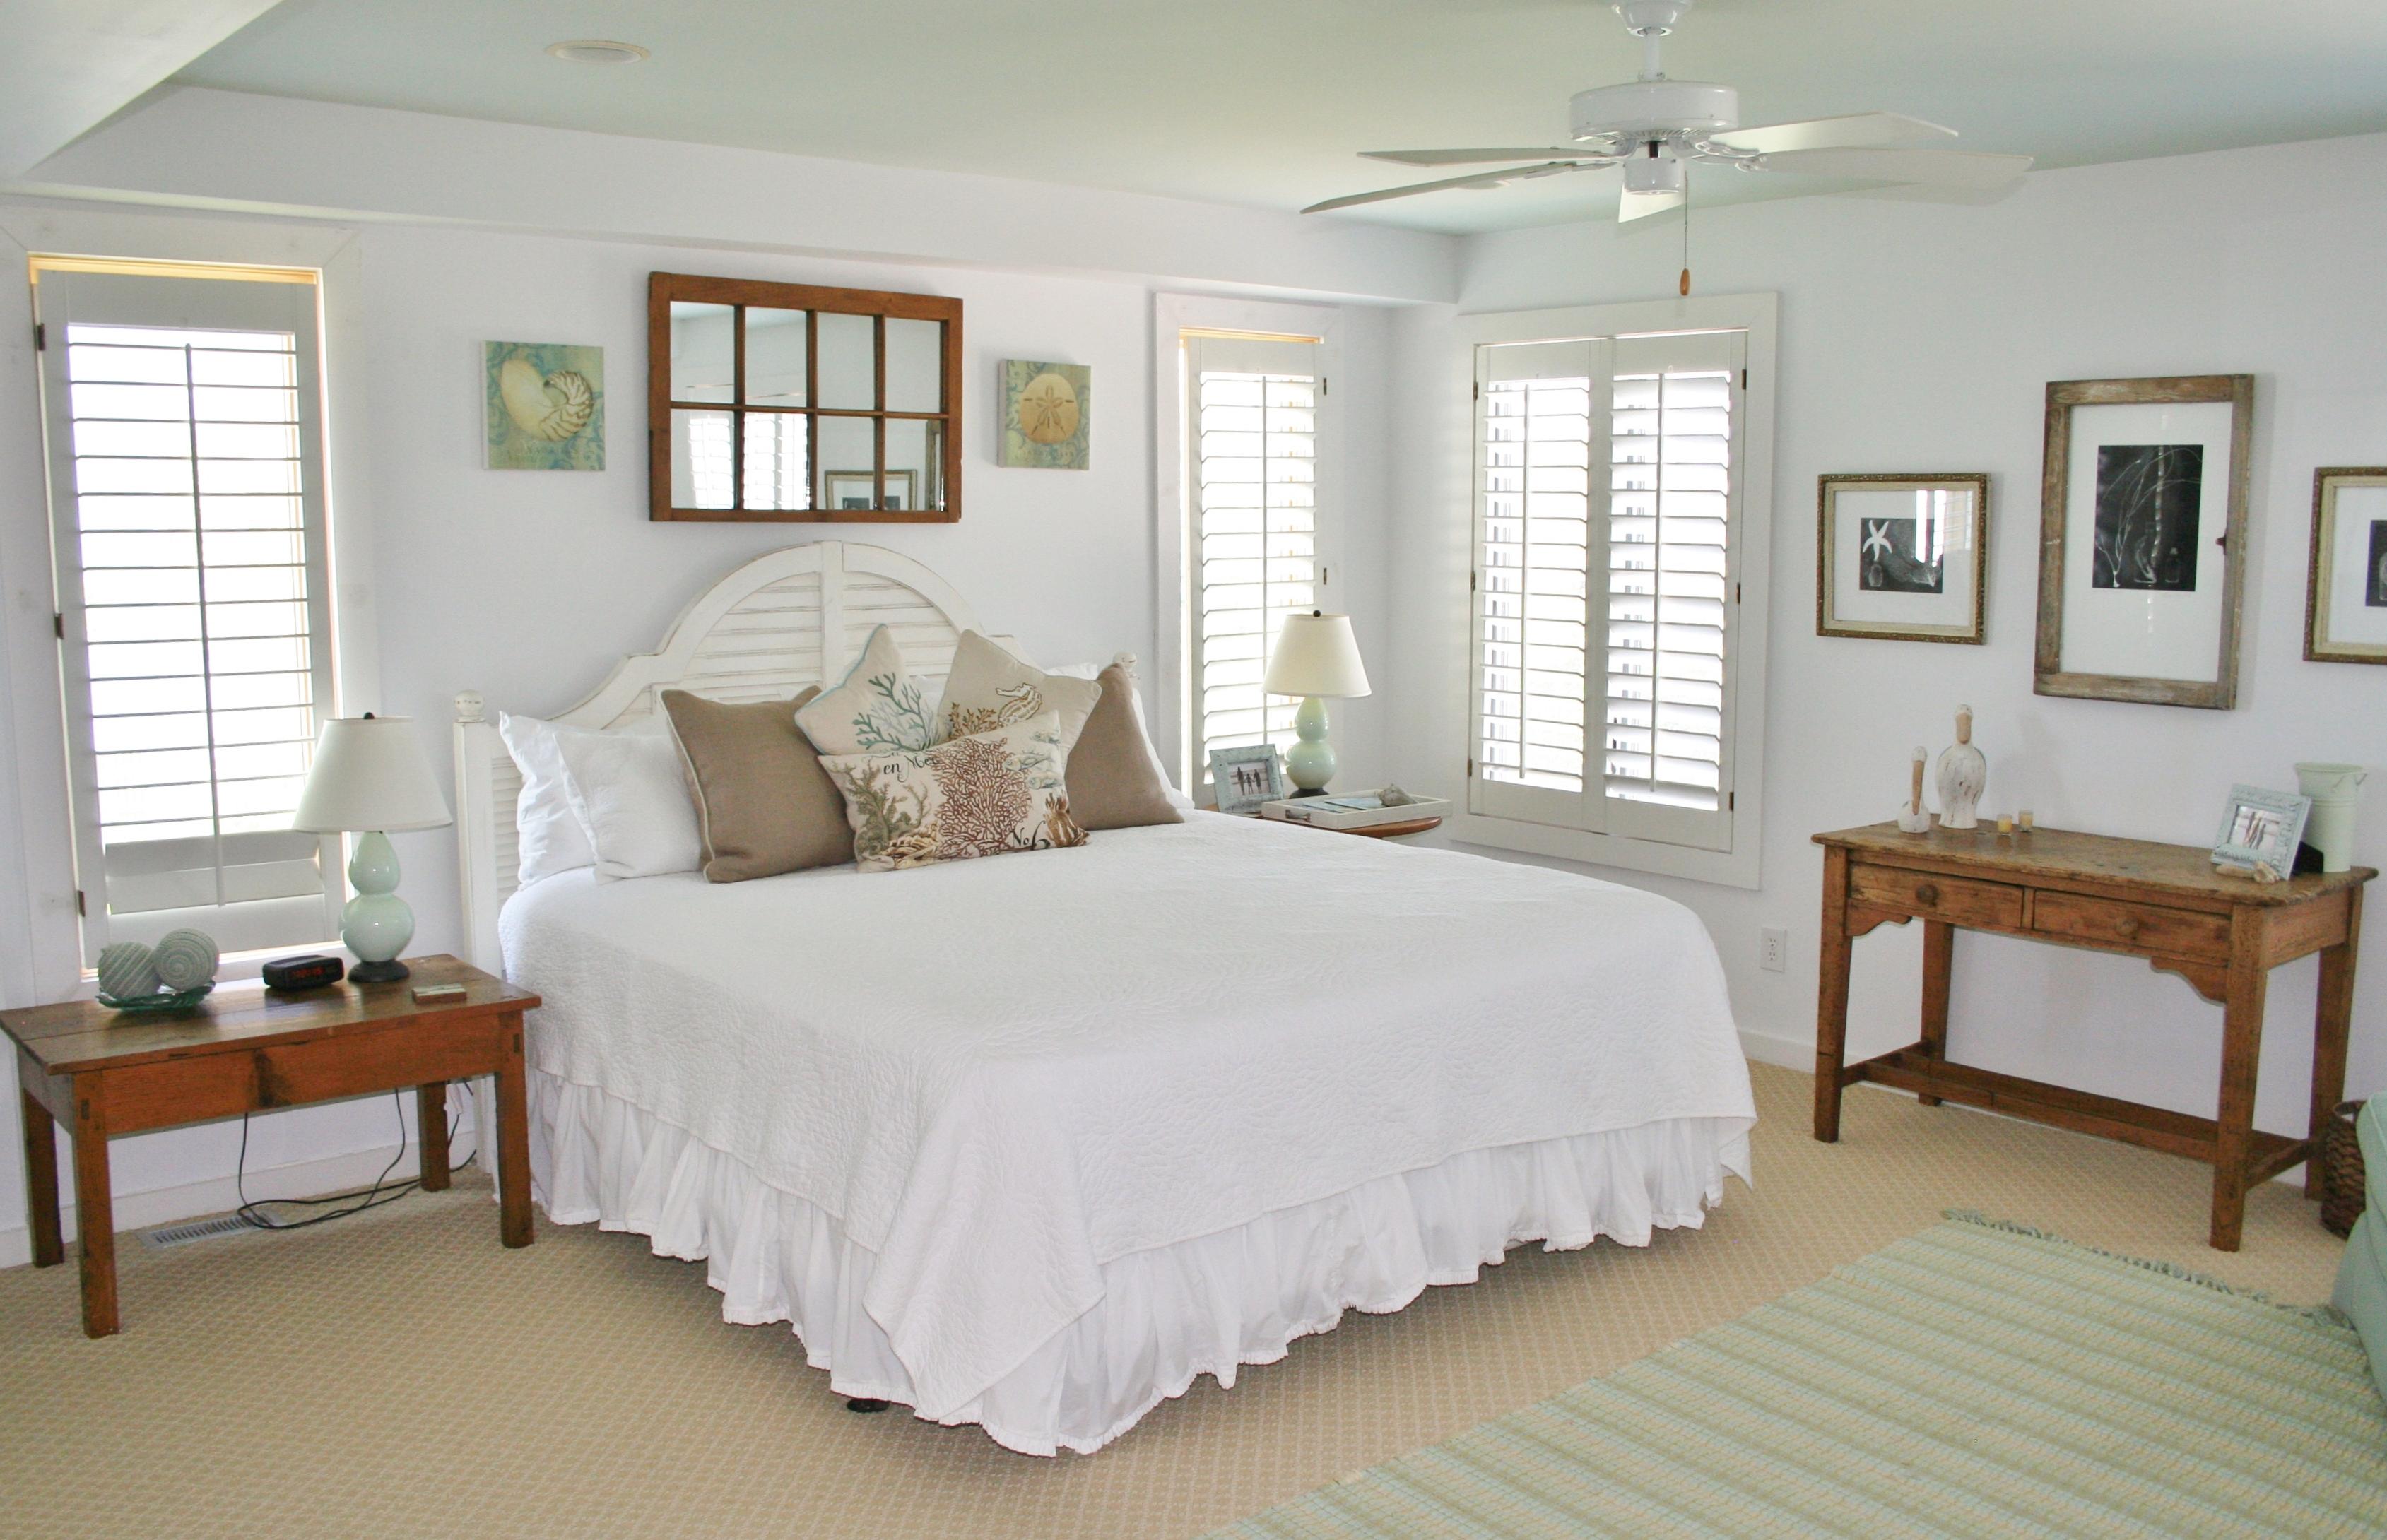 cherok veno figure 8 island vacation rental search